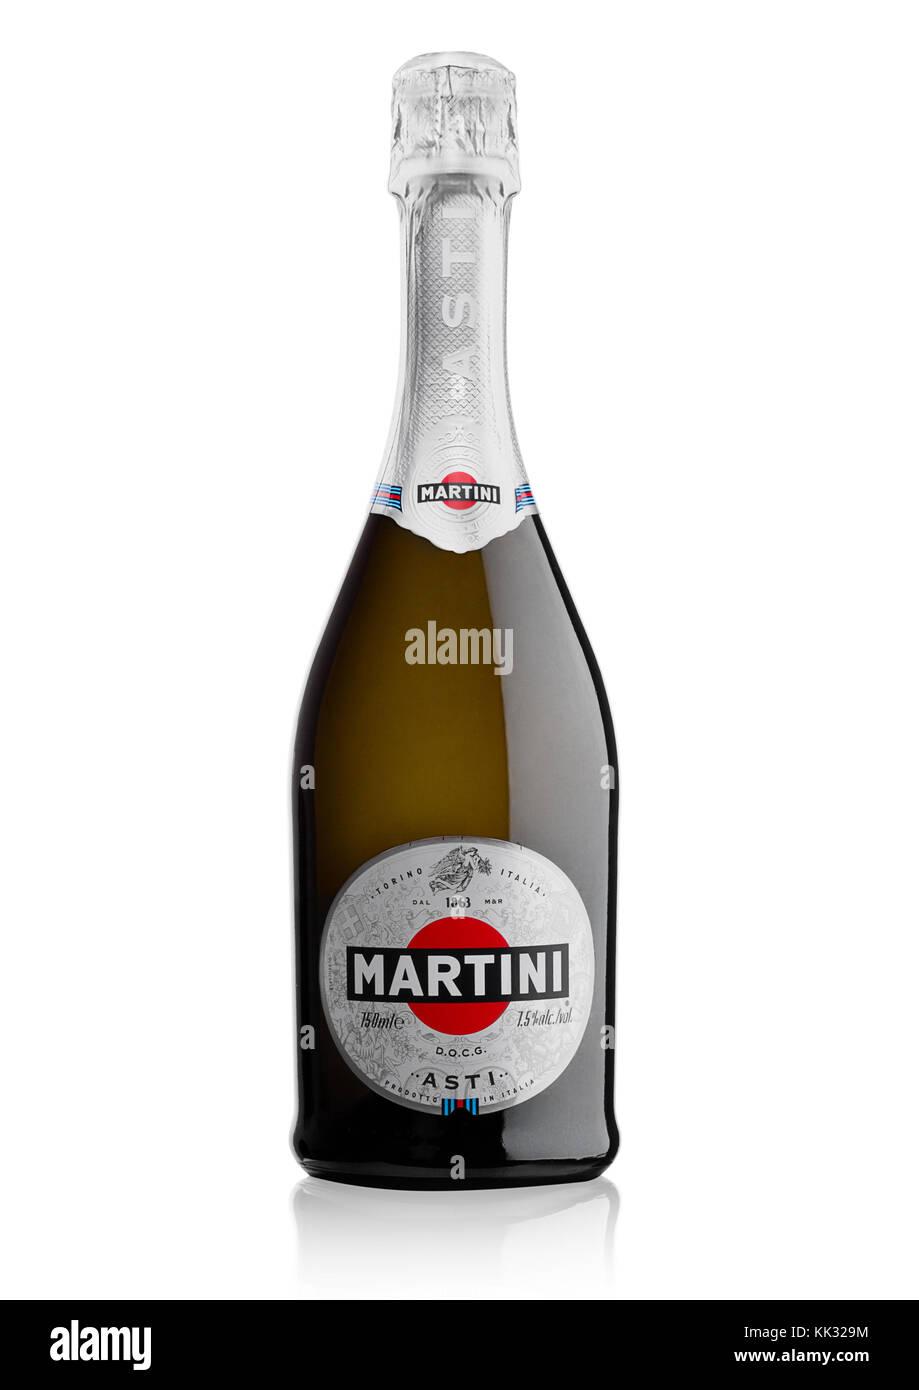 LONDON, UK - November 24, 2017: Bottle of sparkling wine Martini Asti on white background. Produced in Italy Stock Photo